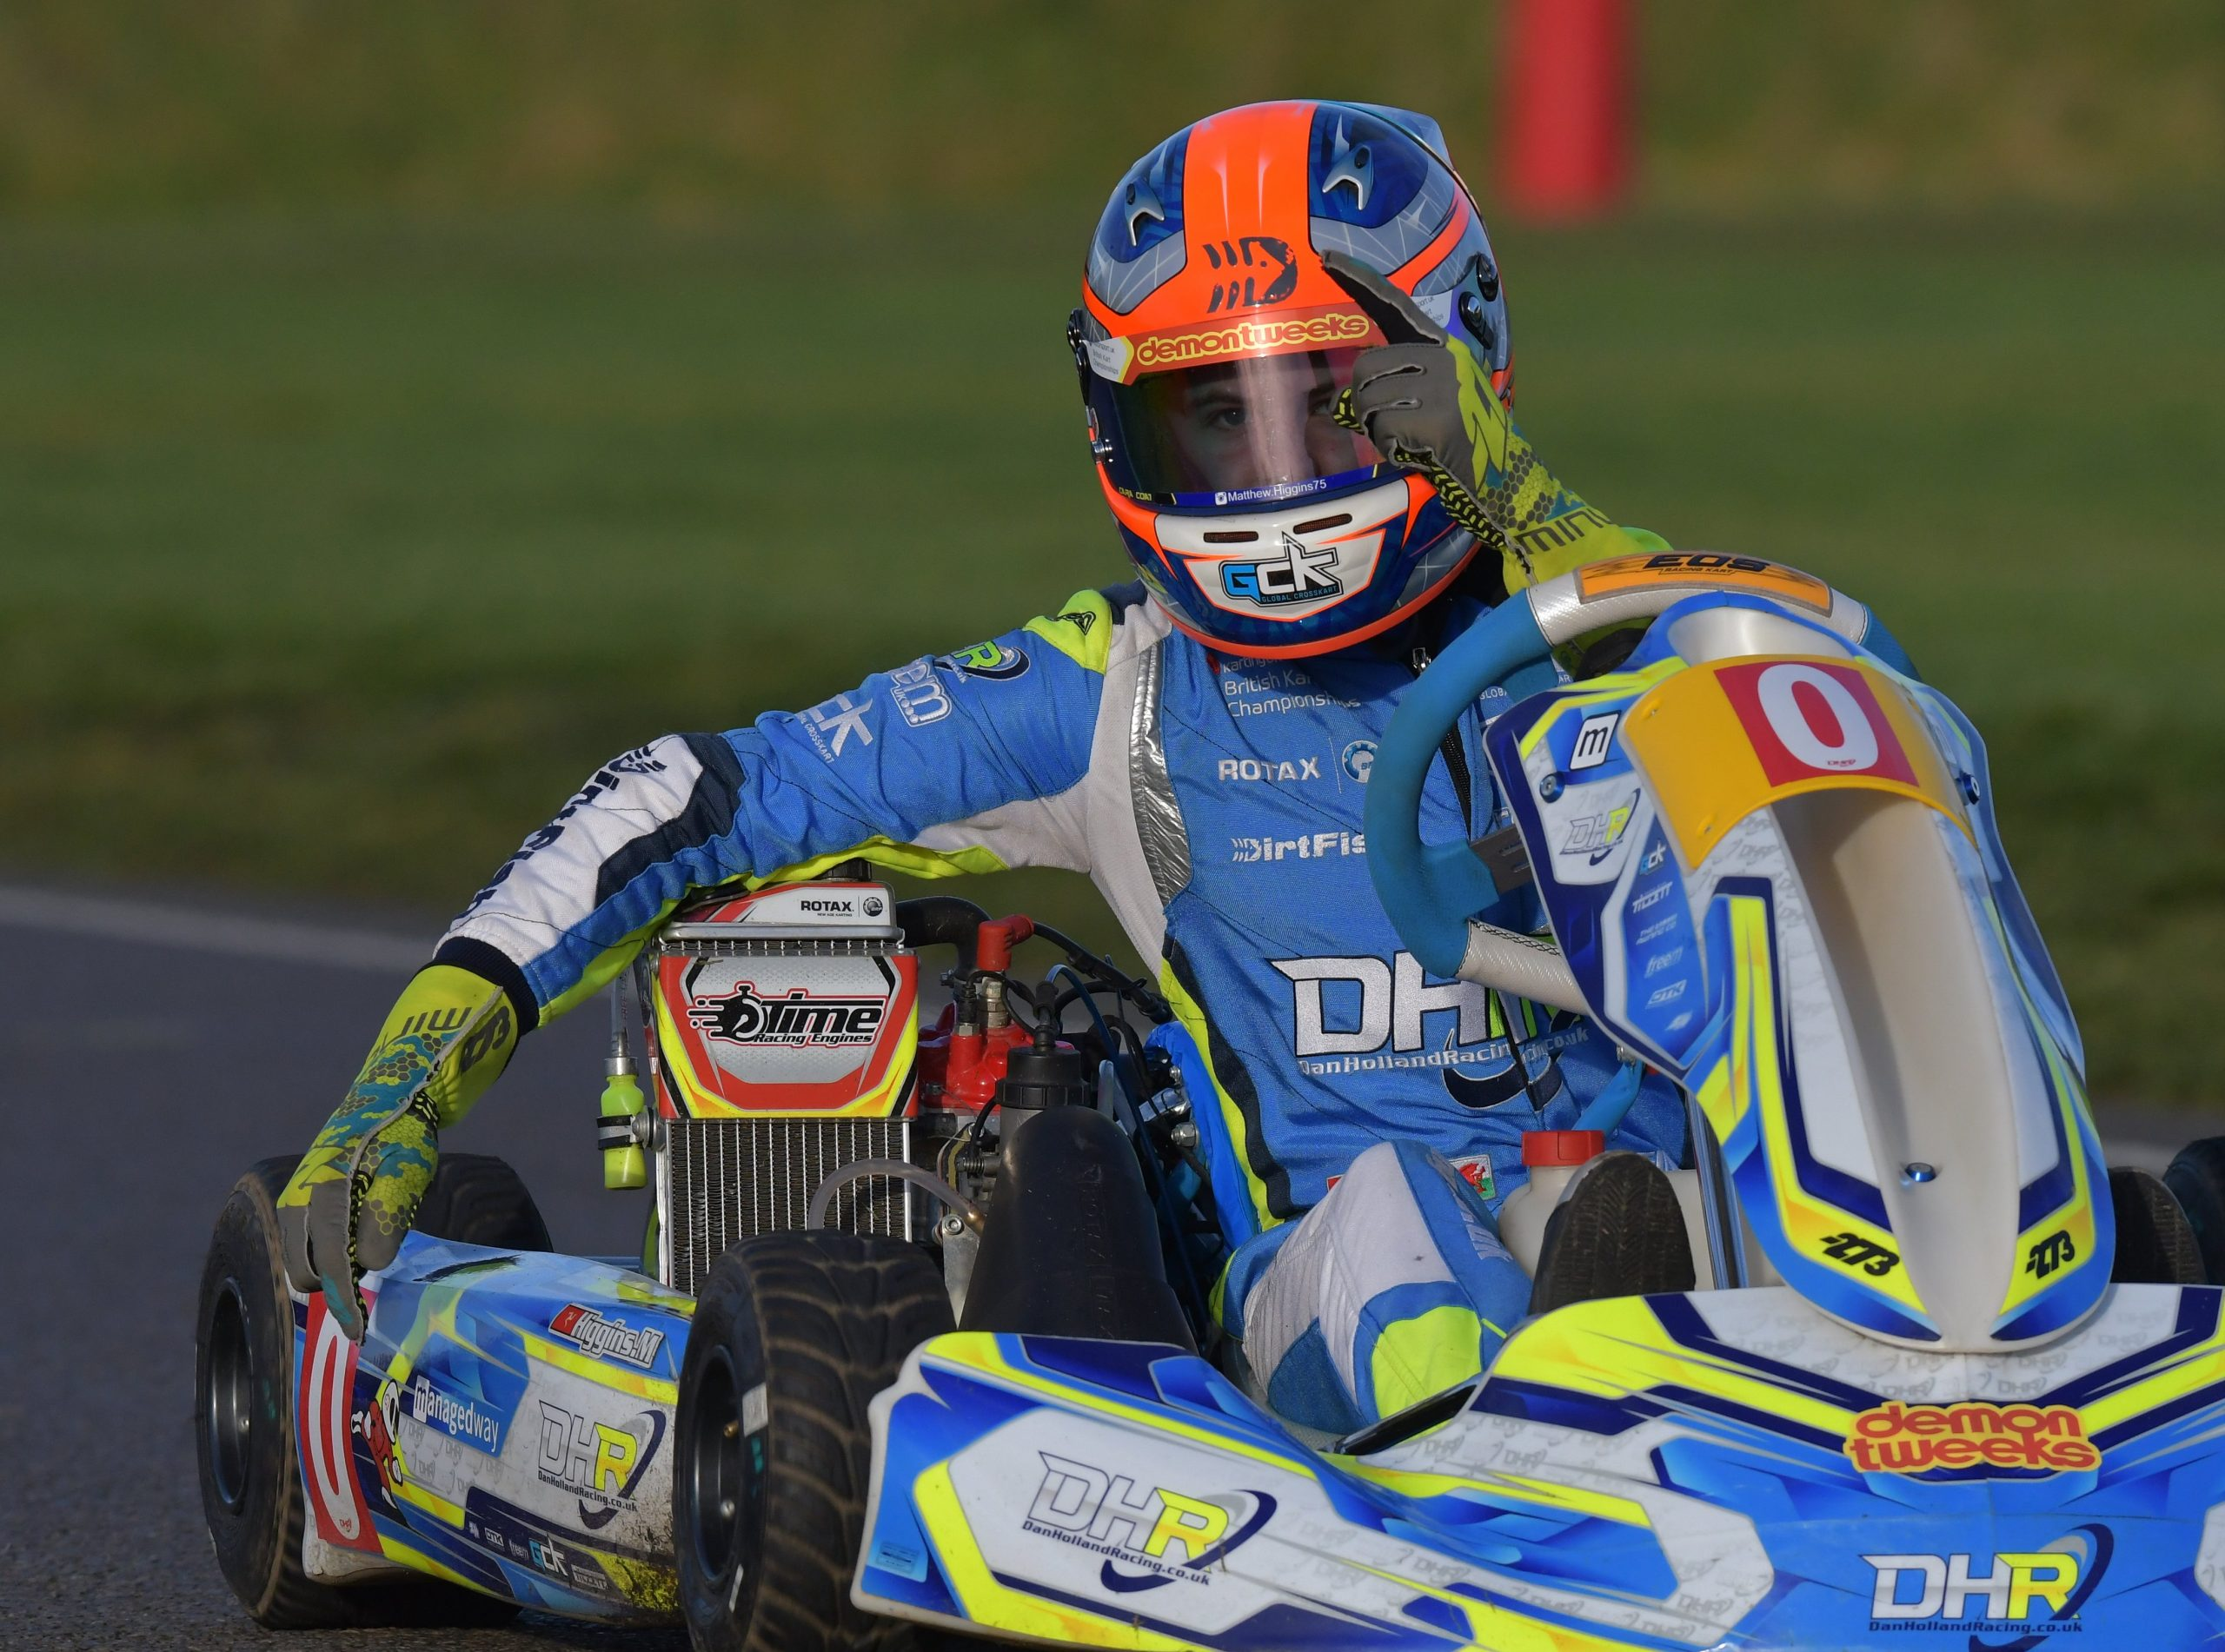 2021 Motorsport UK British Kart Championships Rotax calendar revealed